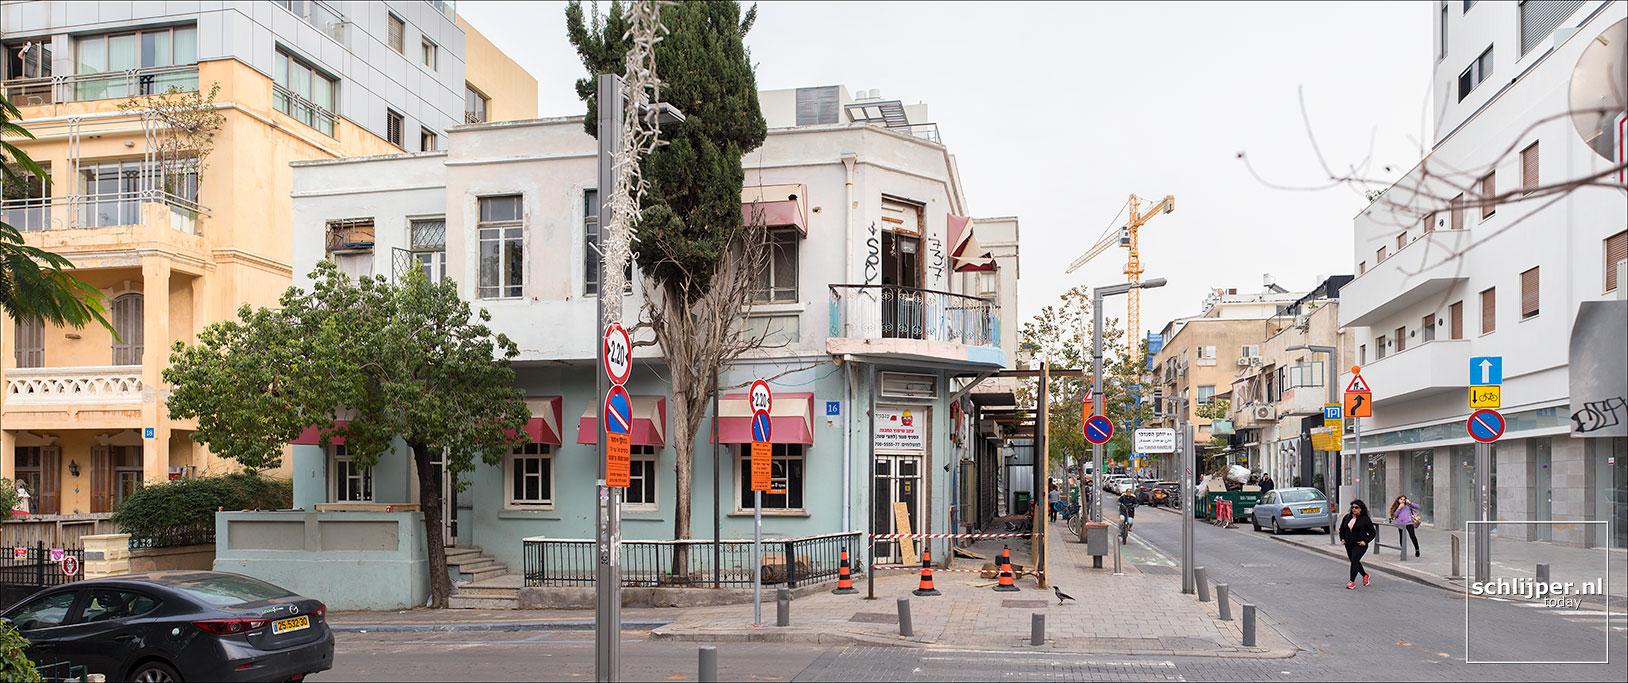 Israel, Tel Aviv, 10 januari 2018